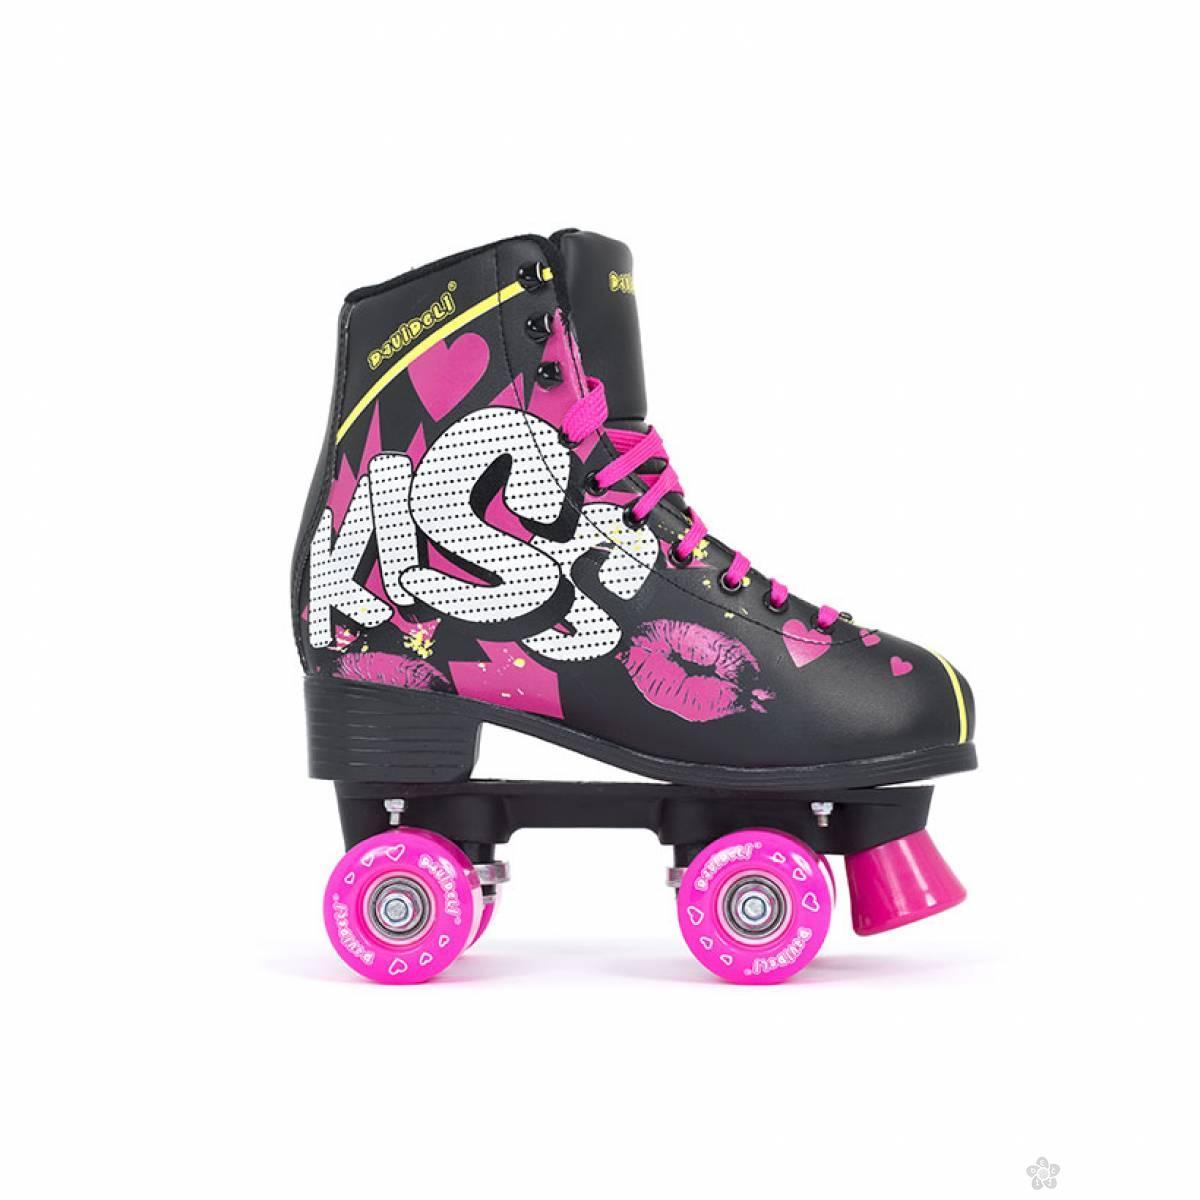 Disko rošule Kiss love crne DVDL400-9883